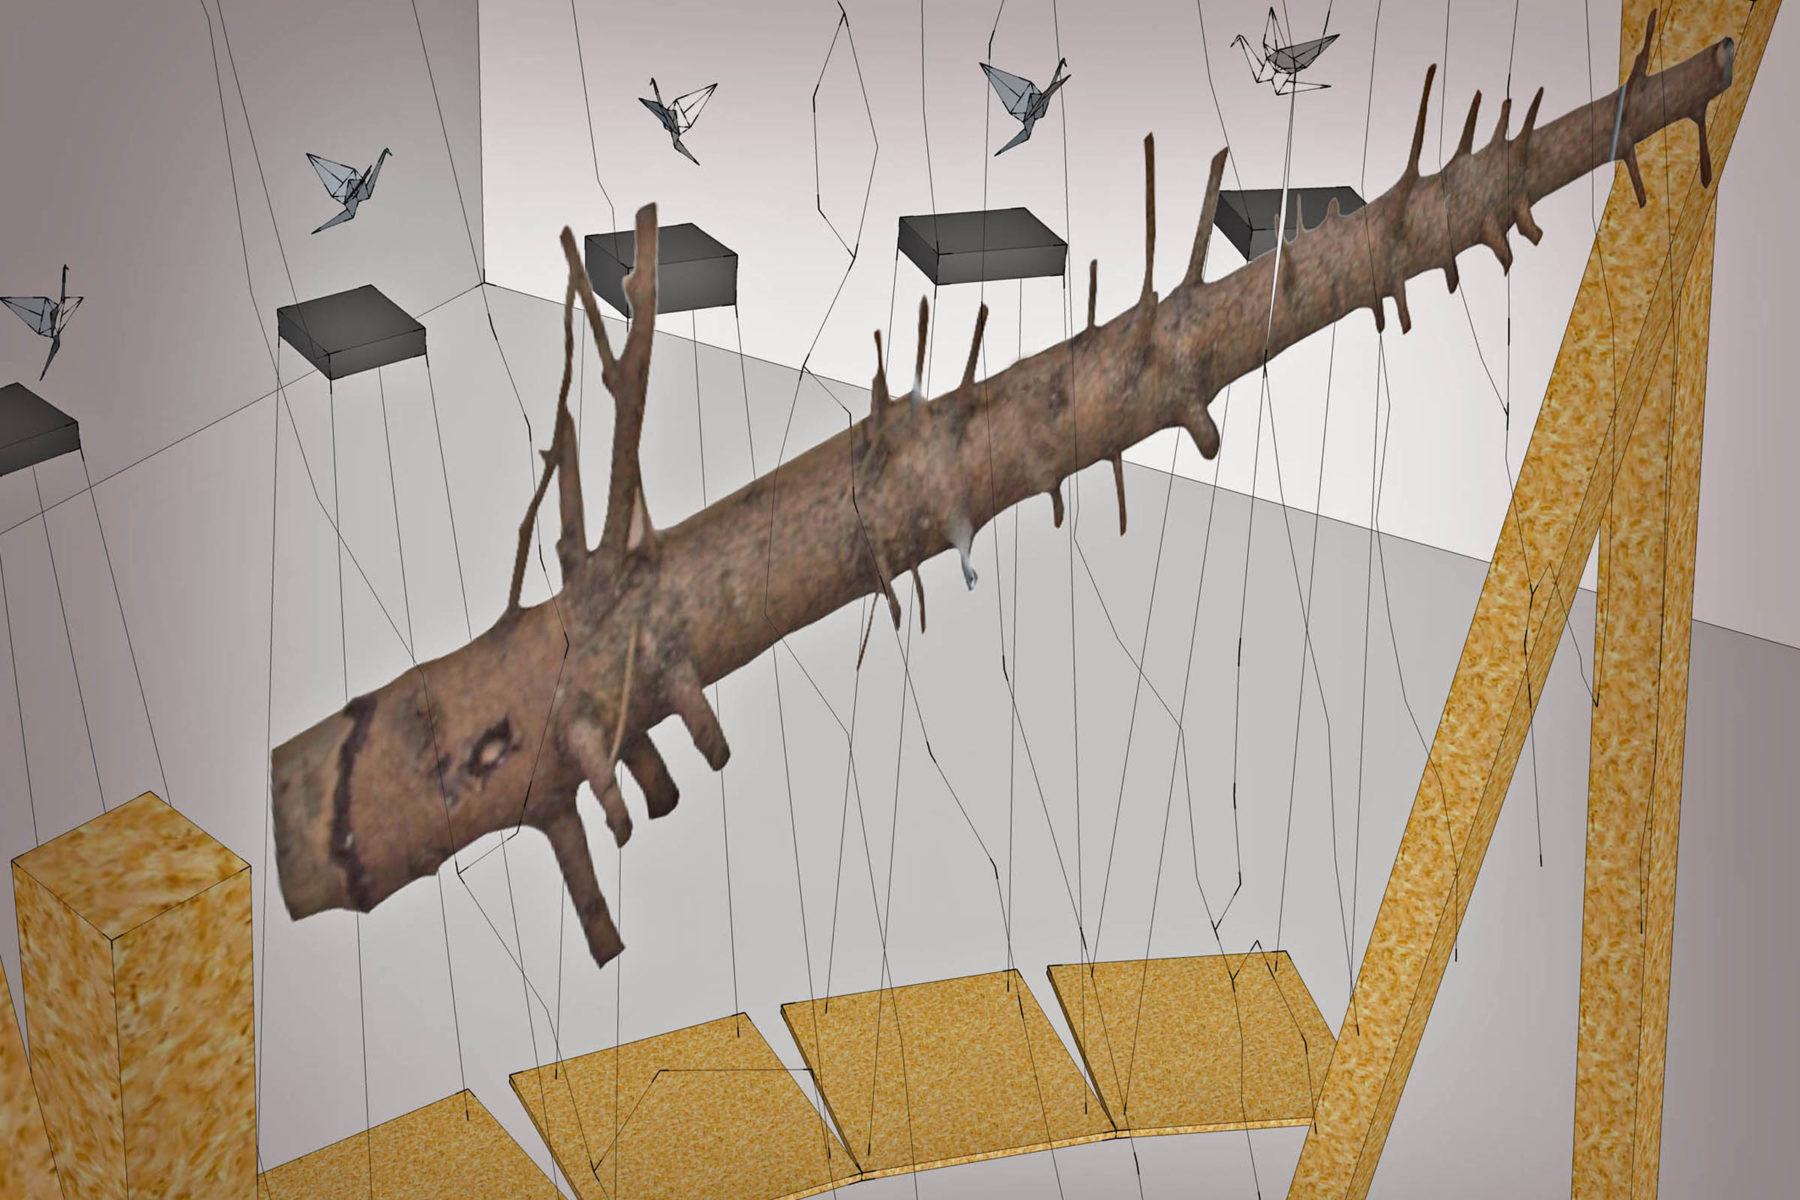 Leonardo Ulian, From zero to one, 2011, mixed media, dimensions according to exhibiting space.